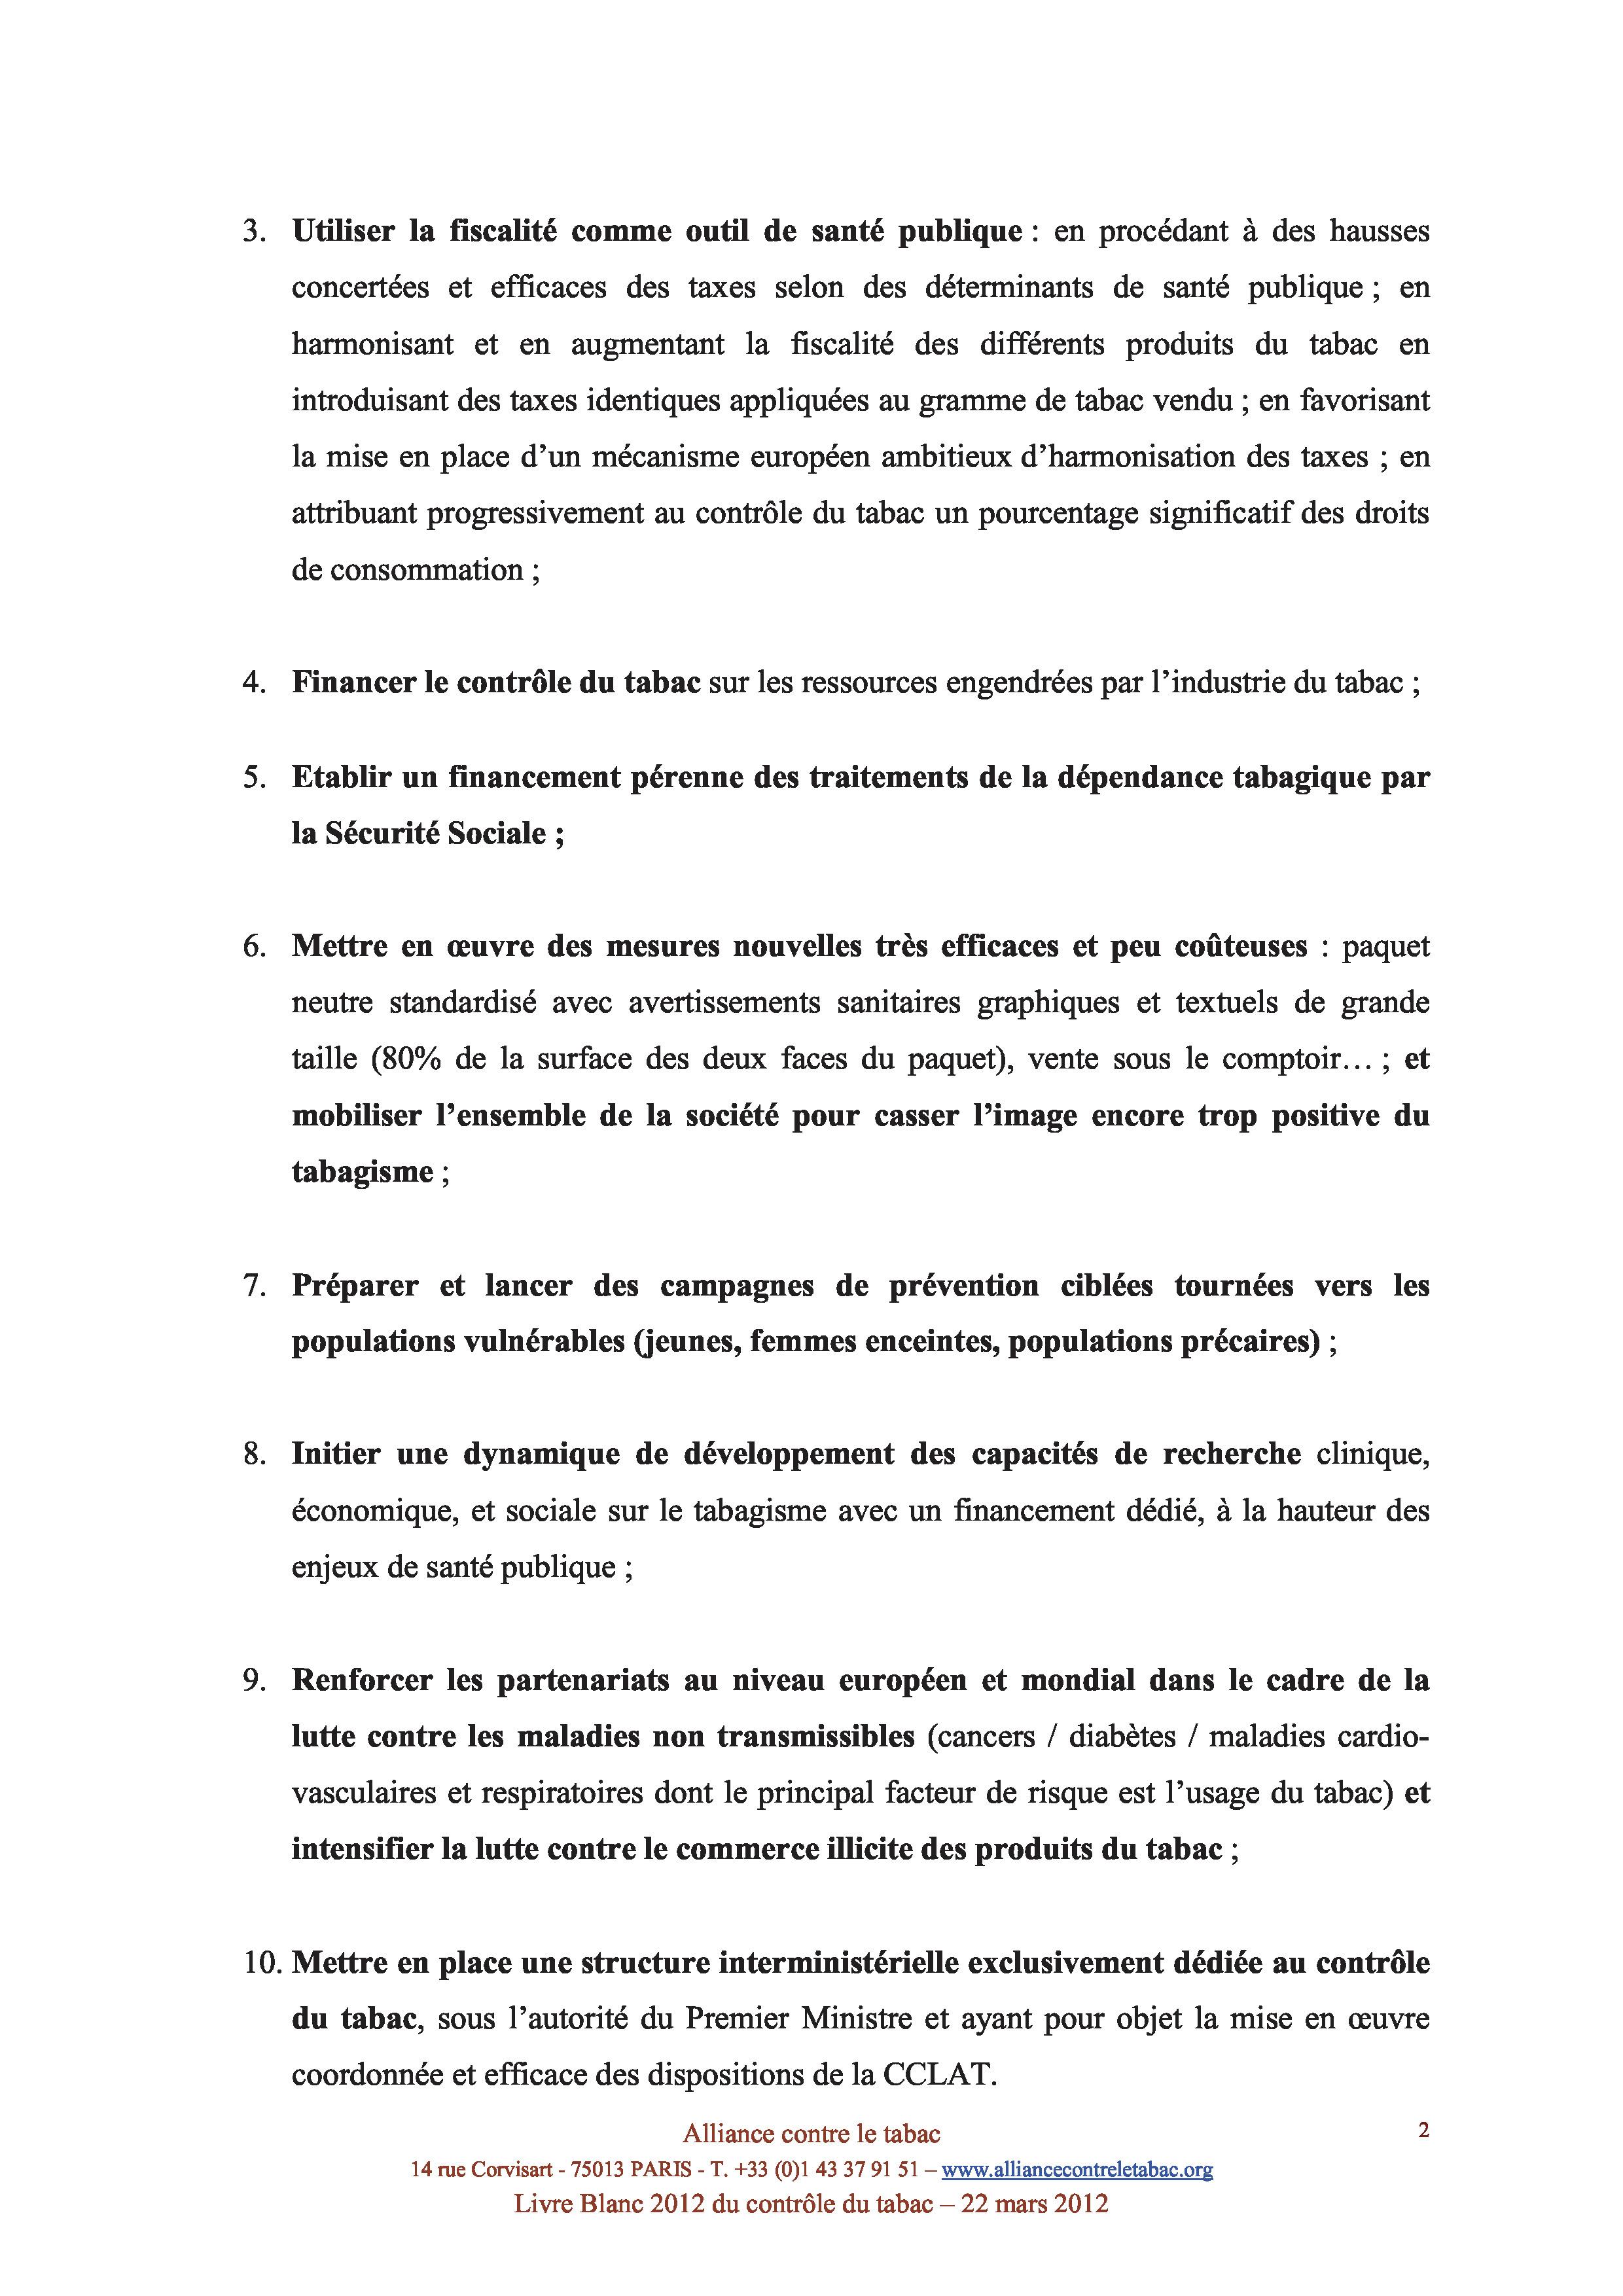 Alliance-dossier-presse-livre-blanc-11avr2012_Page_05.jpg